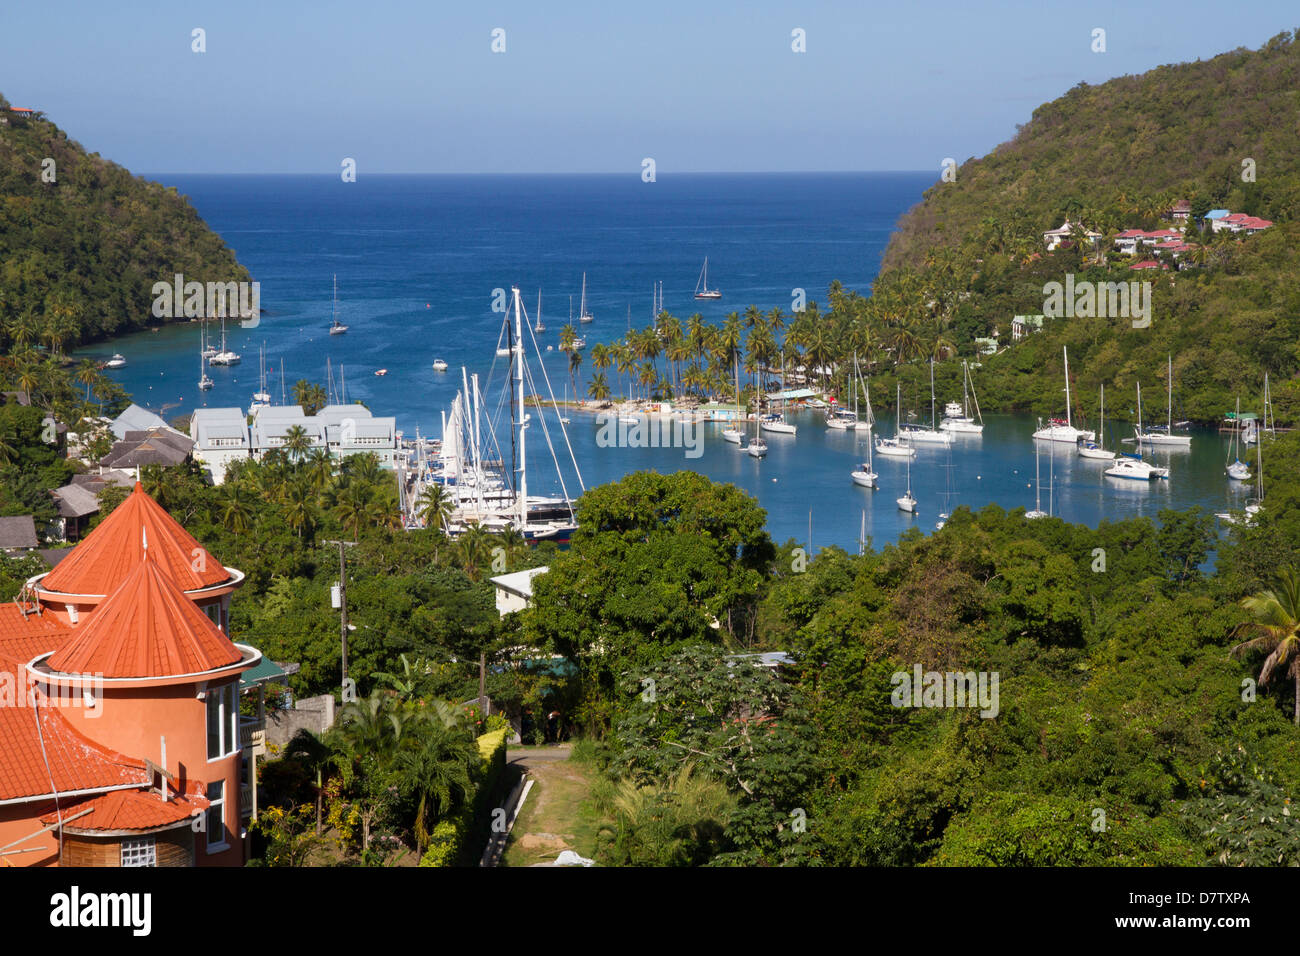 Marigot Bay e yacht, Santa Lucia, isole Windward, West Indies, dei Caraibi Foto Stock